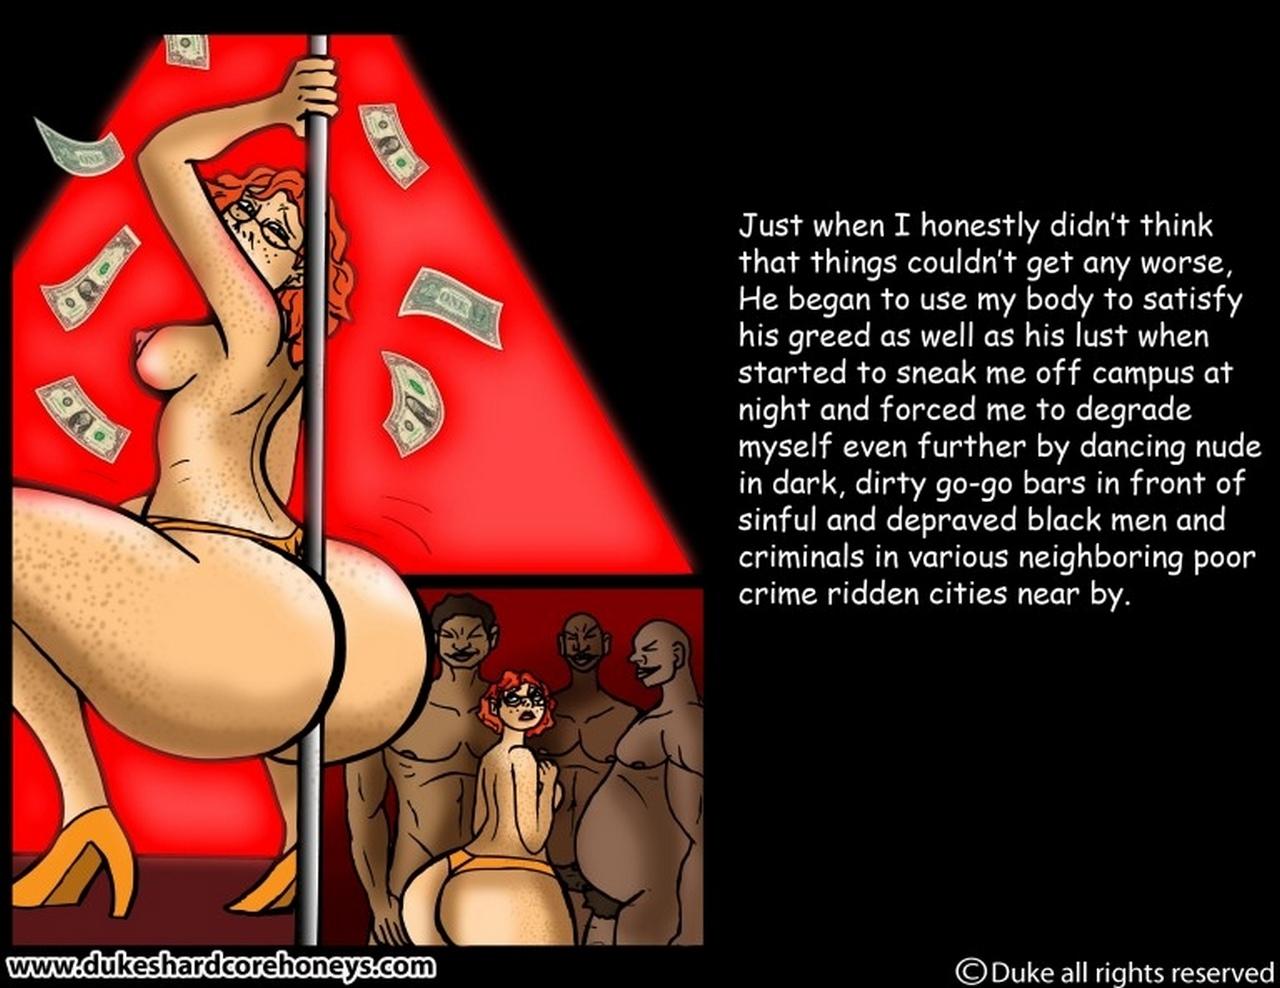 Sister-O-Malley-5 7 free sex comic